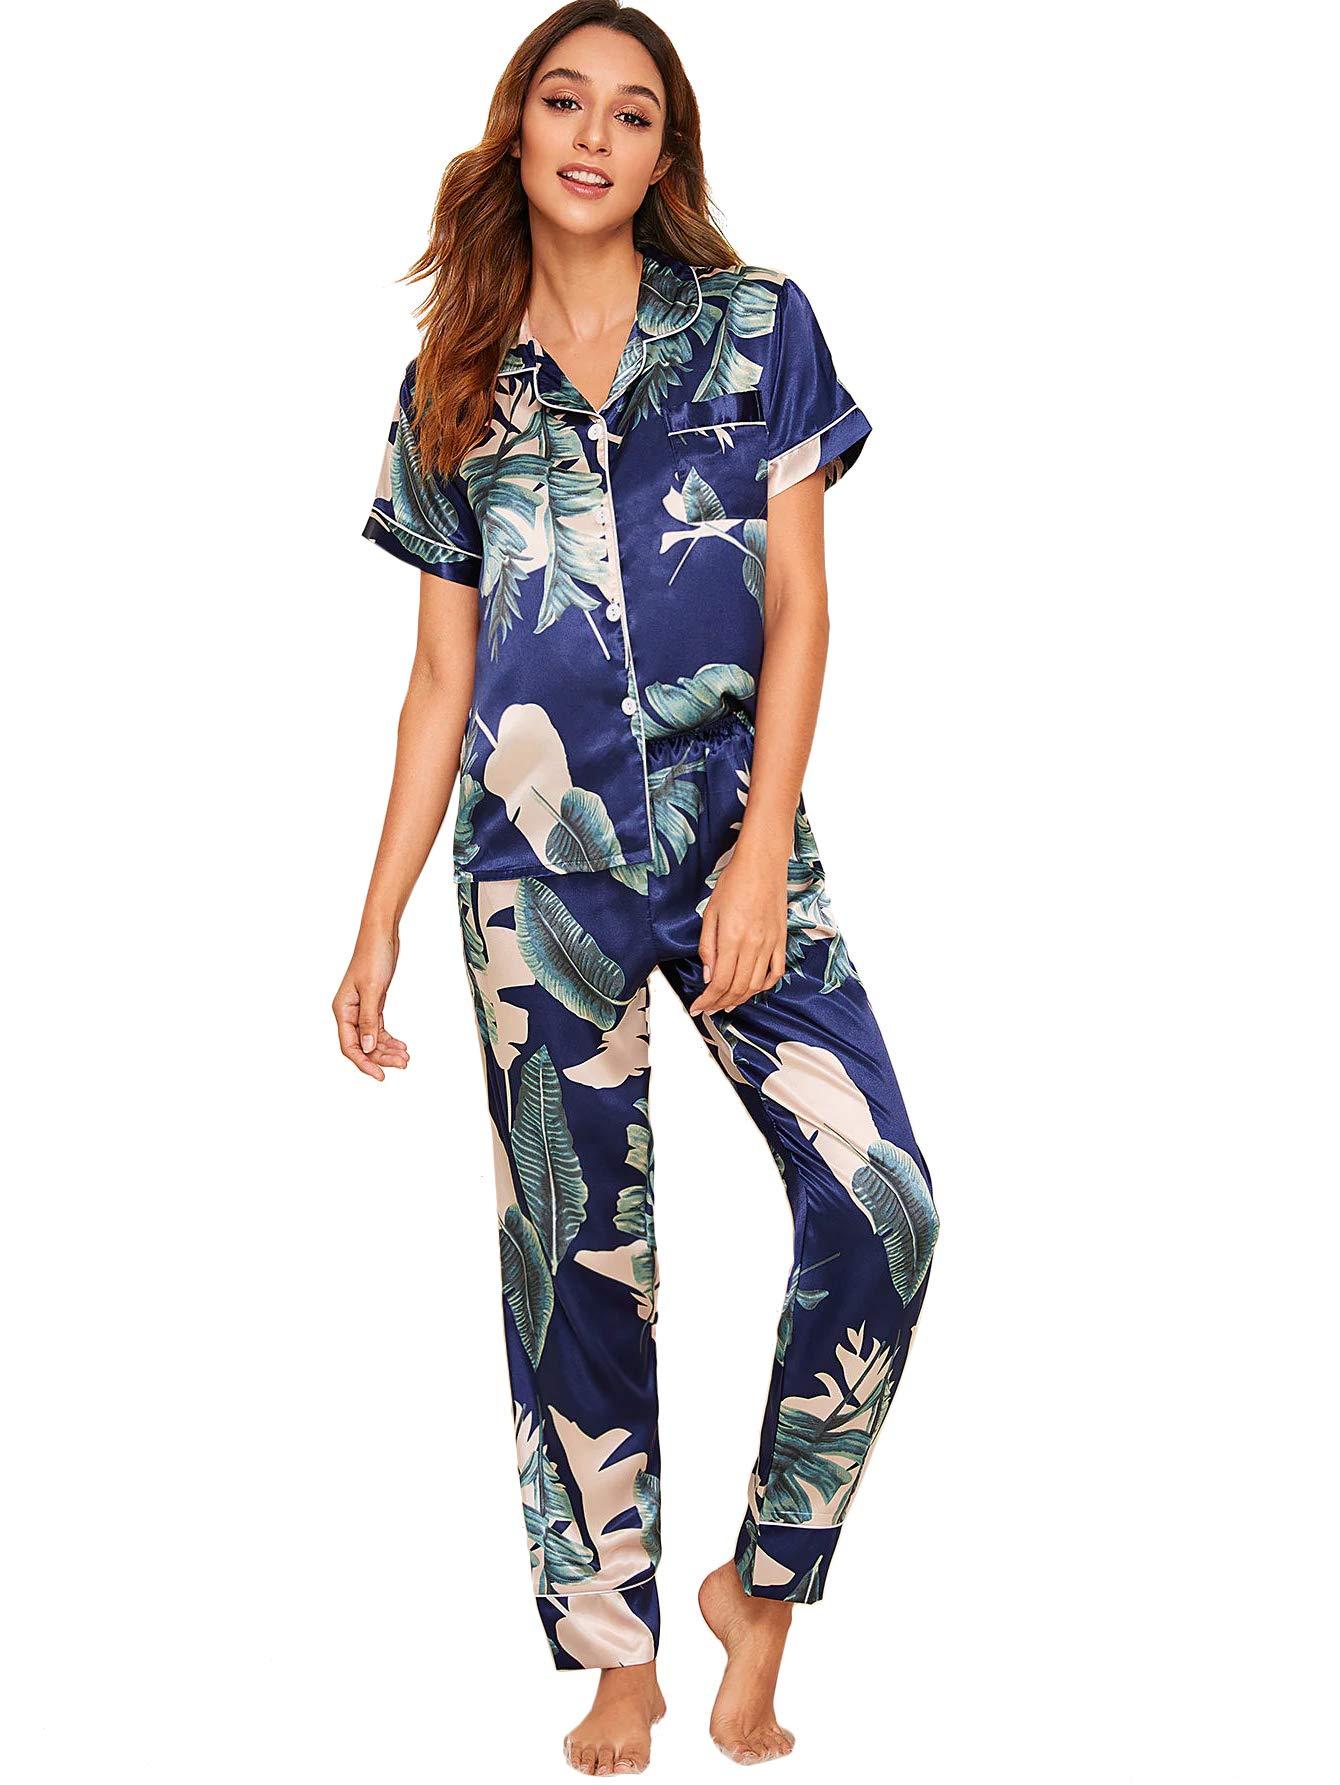 Milumia Womens Pajamas Set Button Down Sleepwear Short Sleeve Nightwear Loungewear Pants